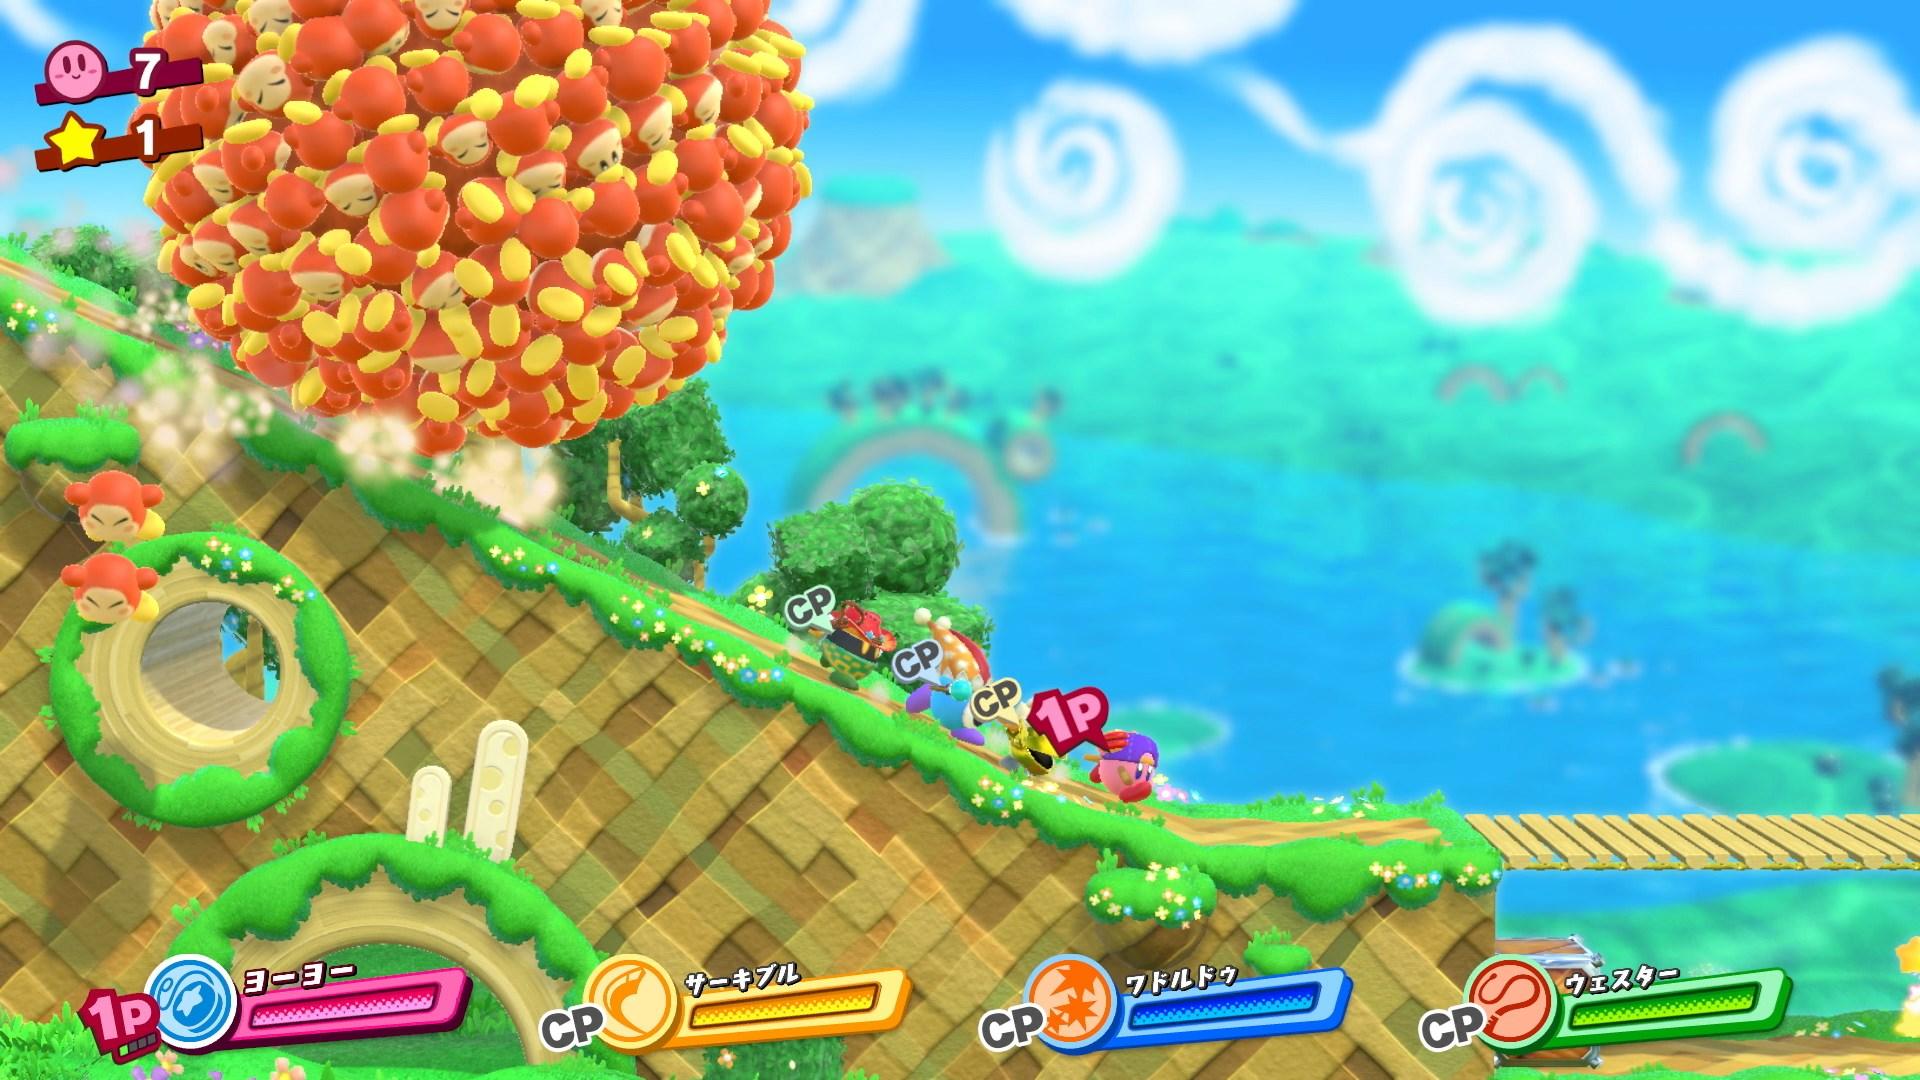 Kirby Star Allies Screen 3